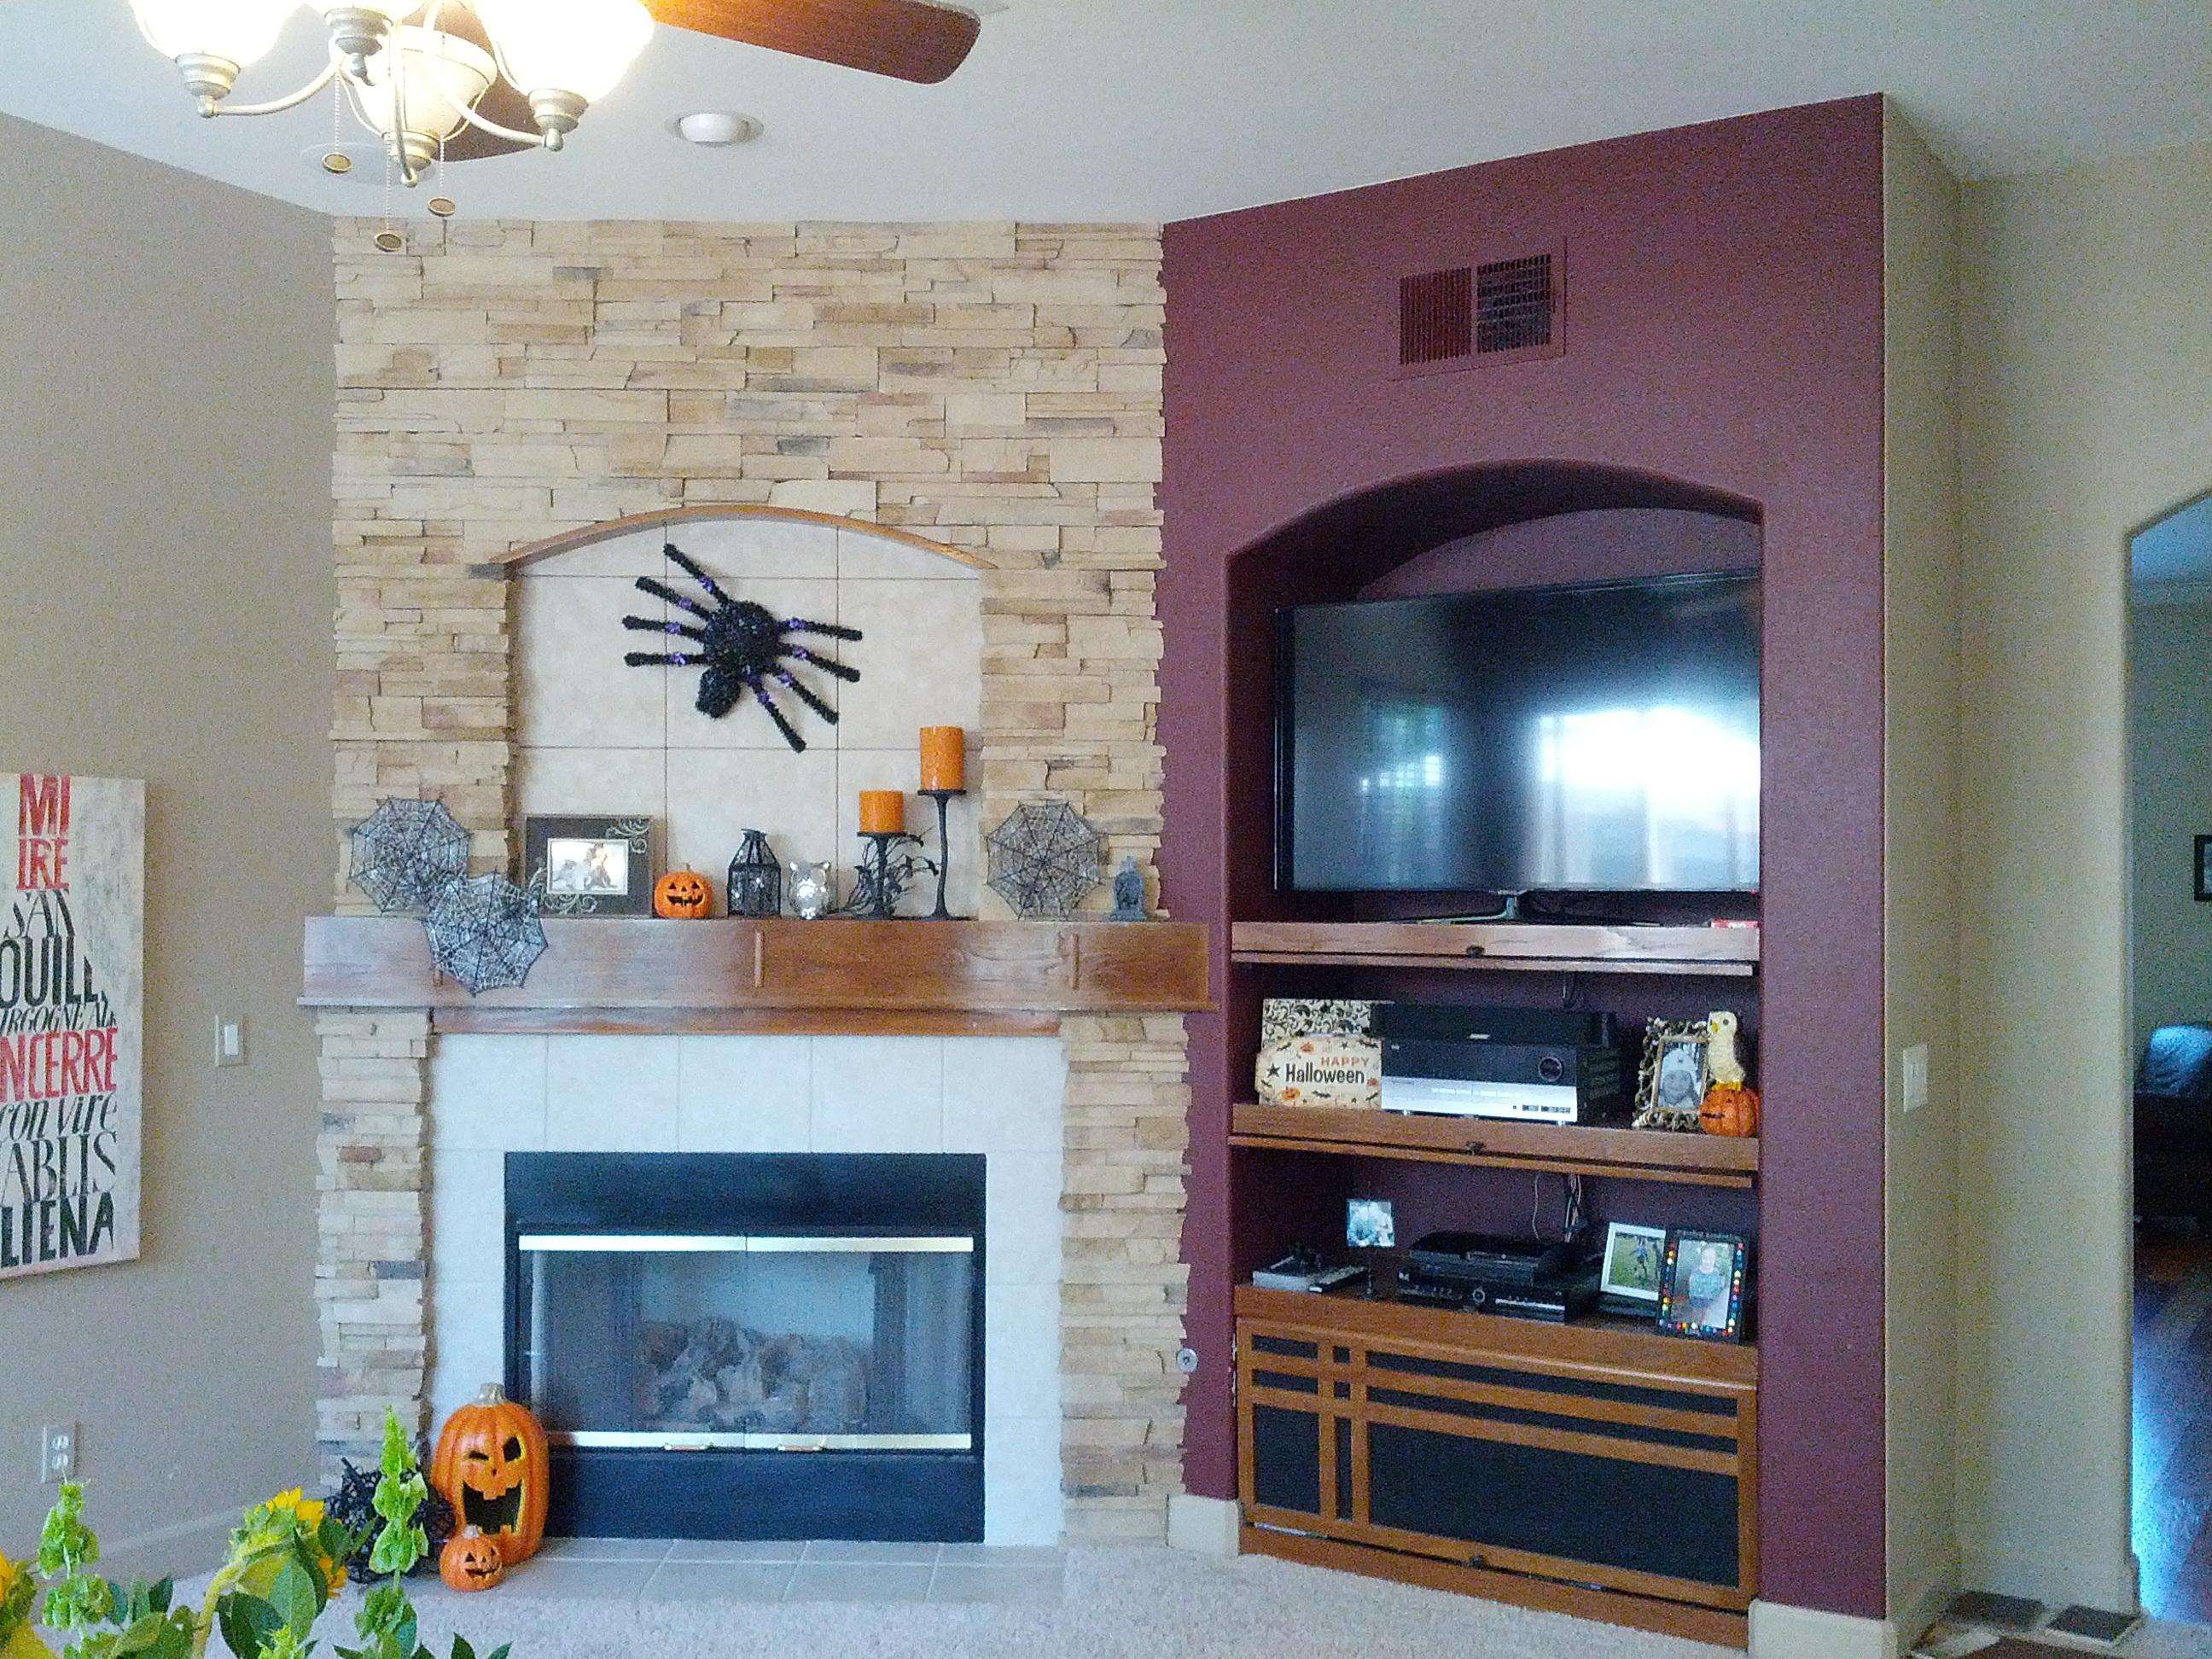 Sensational How To Decorate Tv Niche Above Fireplace Fireplace Design Home Interior And Landscaping Mentranervesignezvosmurscom